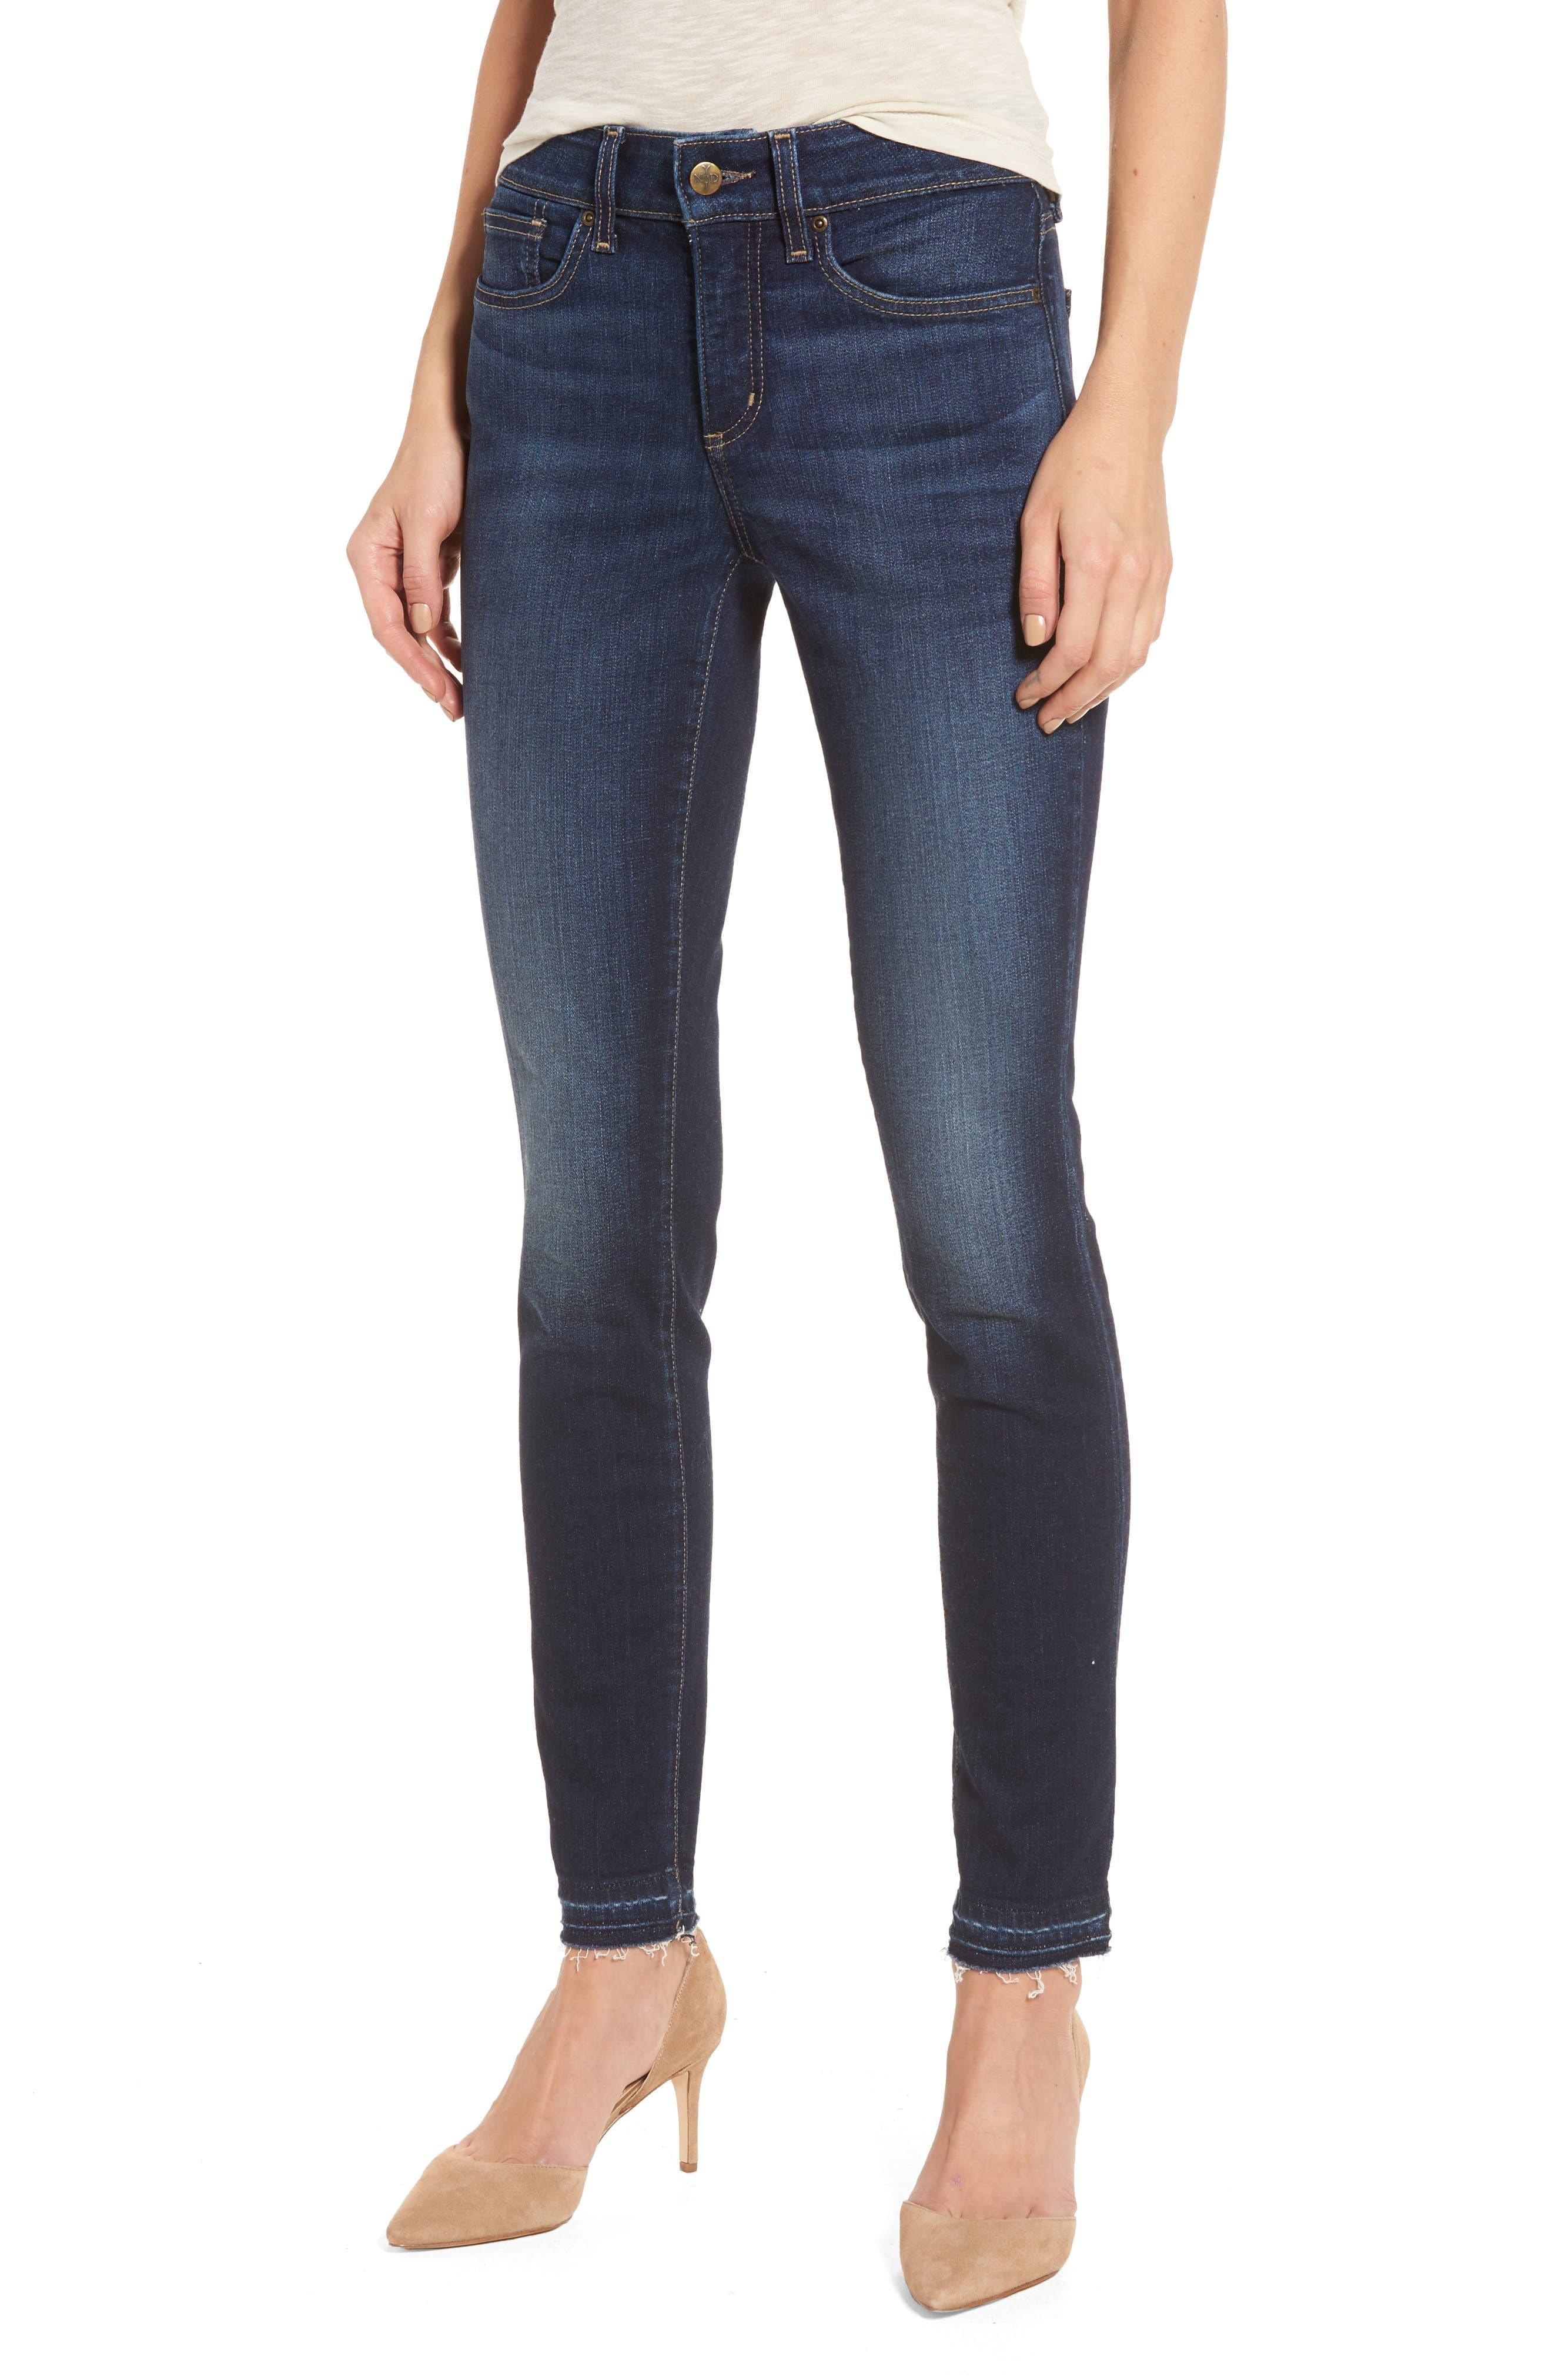 Alina Release Hem Stretch Ankle Jeans,                         Main,                         color, Bezel